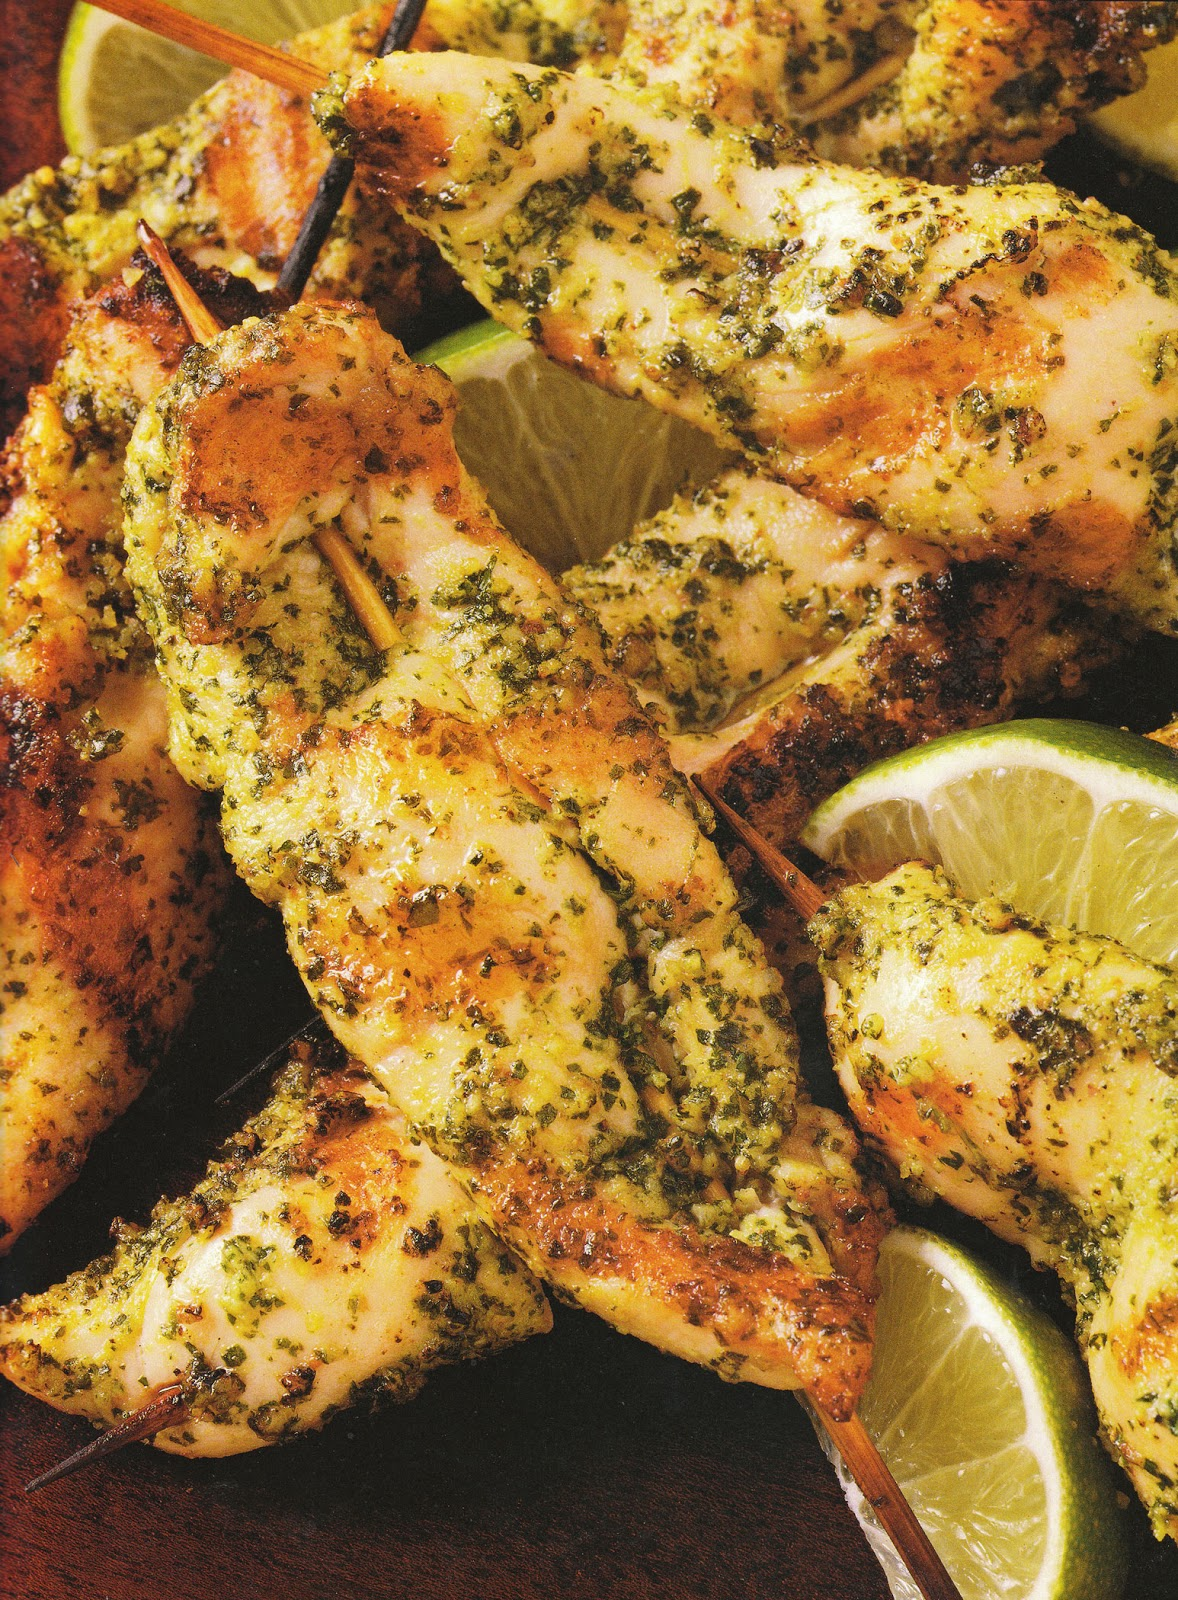 Our Sweet Lemons: Cilantro Pesto Chicken Tenders